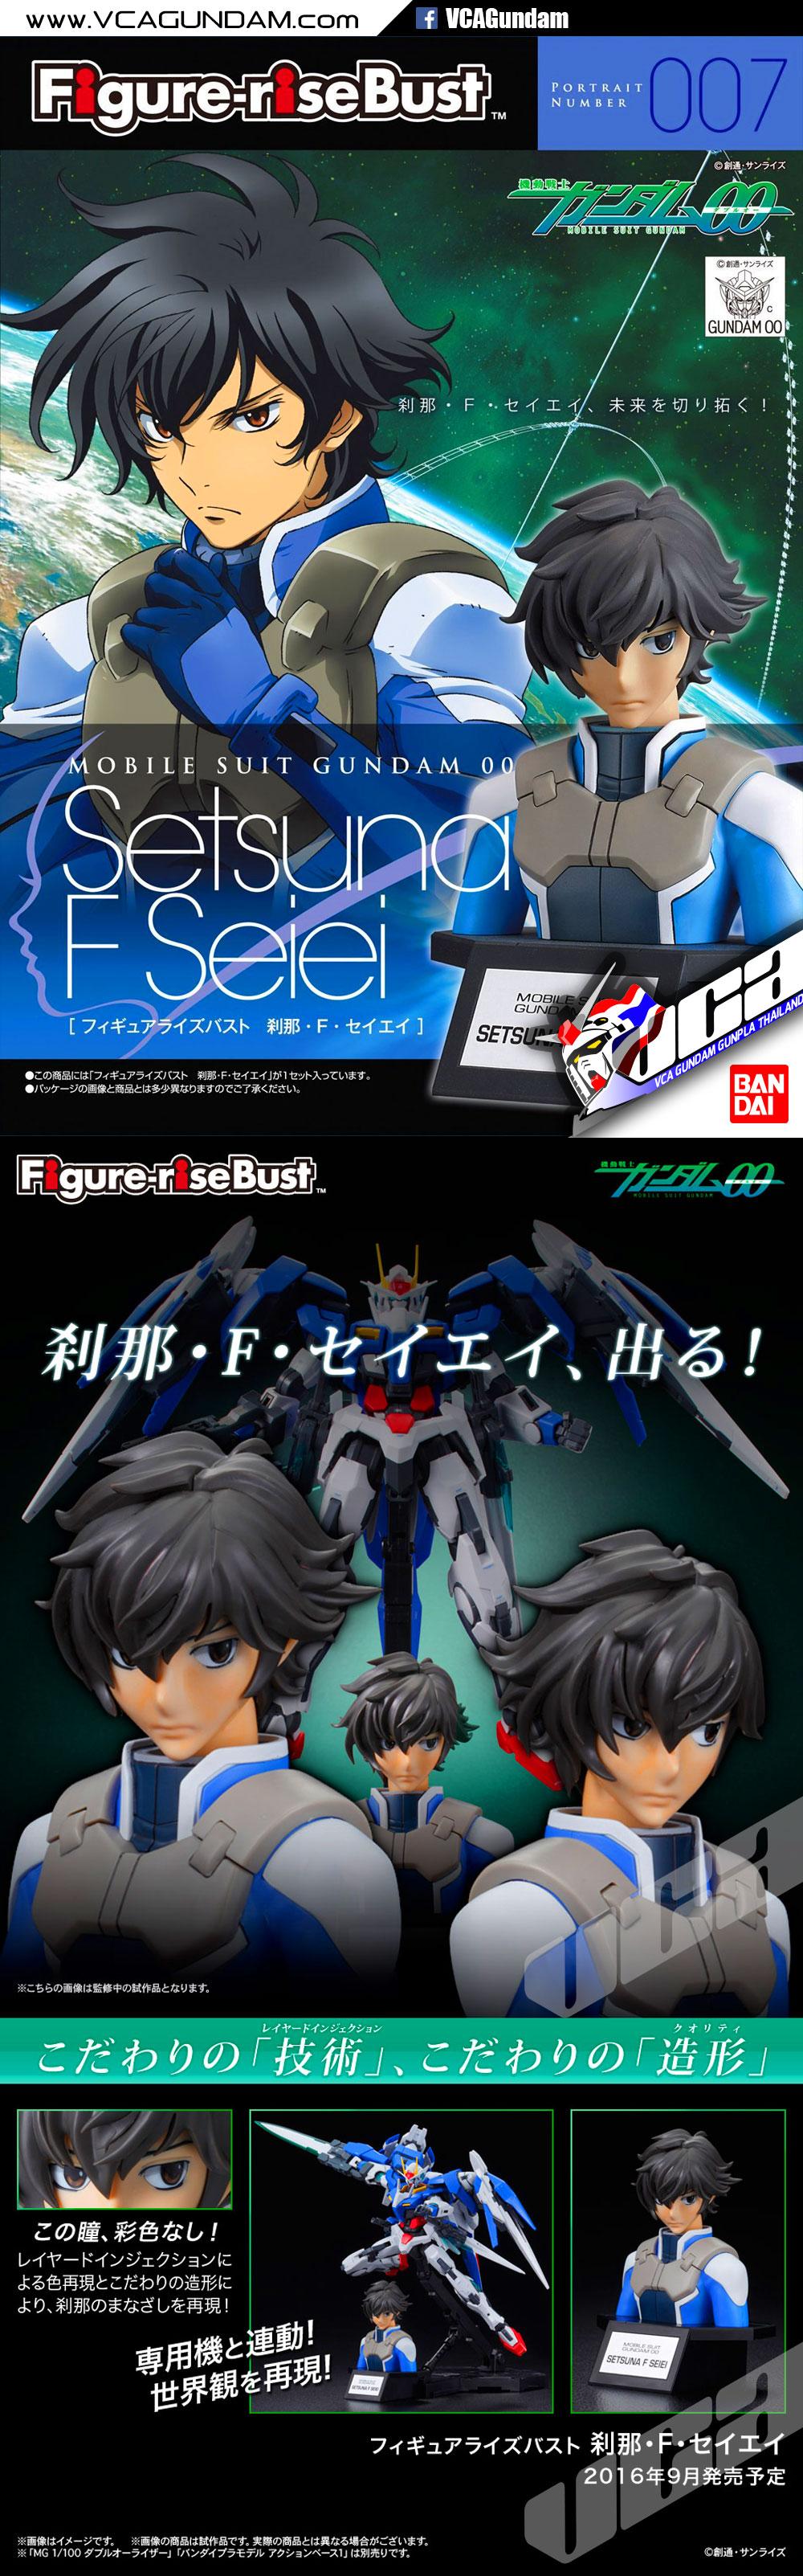 Figure-rise Bust SETSUNA F SEIEI เซ็ทซึนะ เอฟ เซเอ